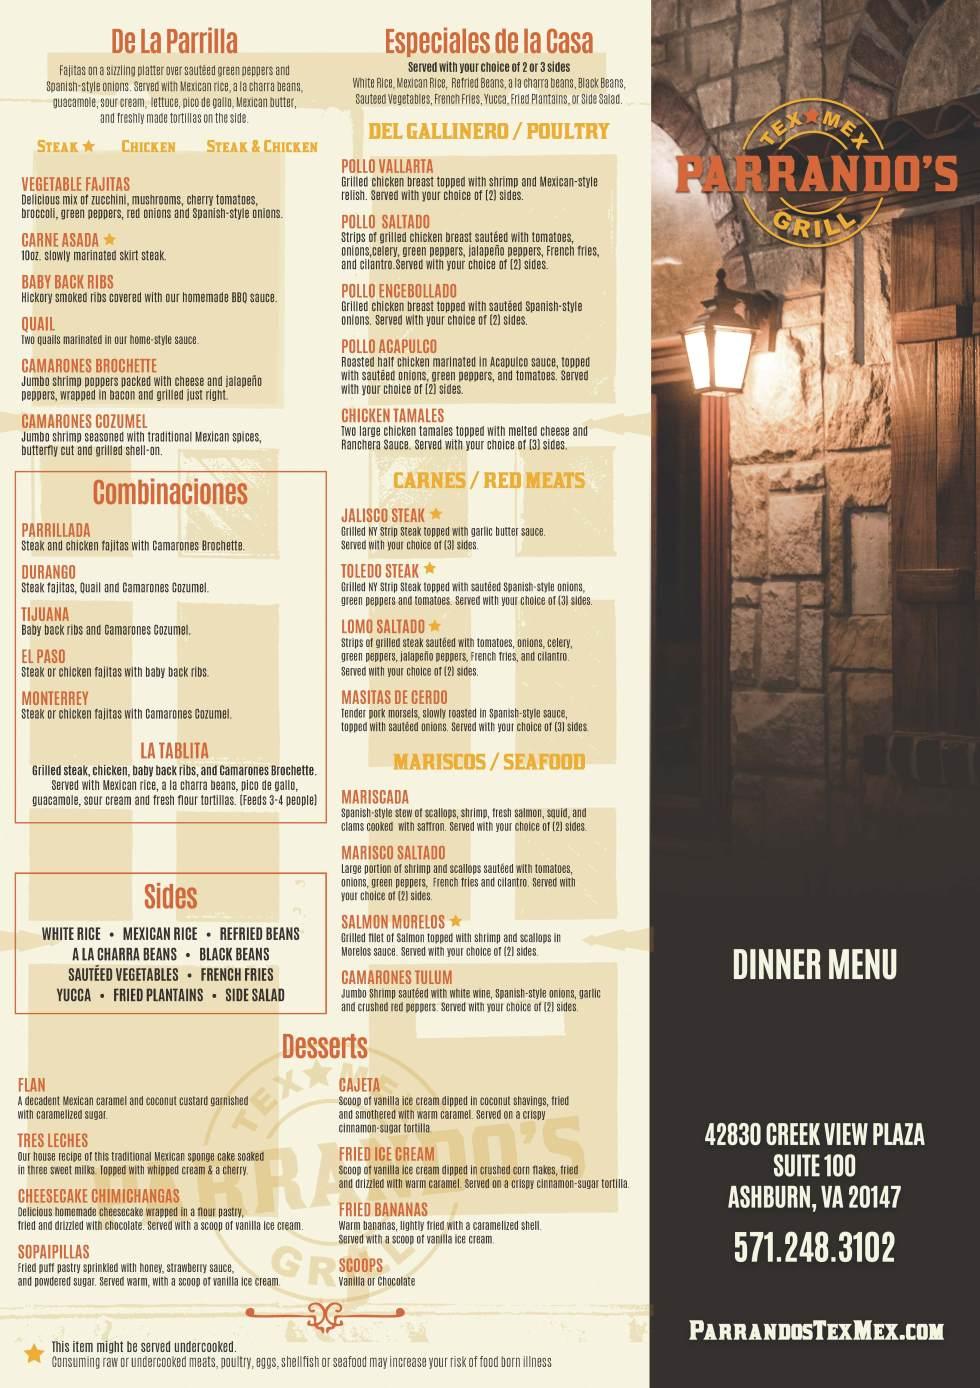 menu-dinner-parrandos-noprices-final-120916l_page_1